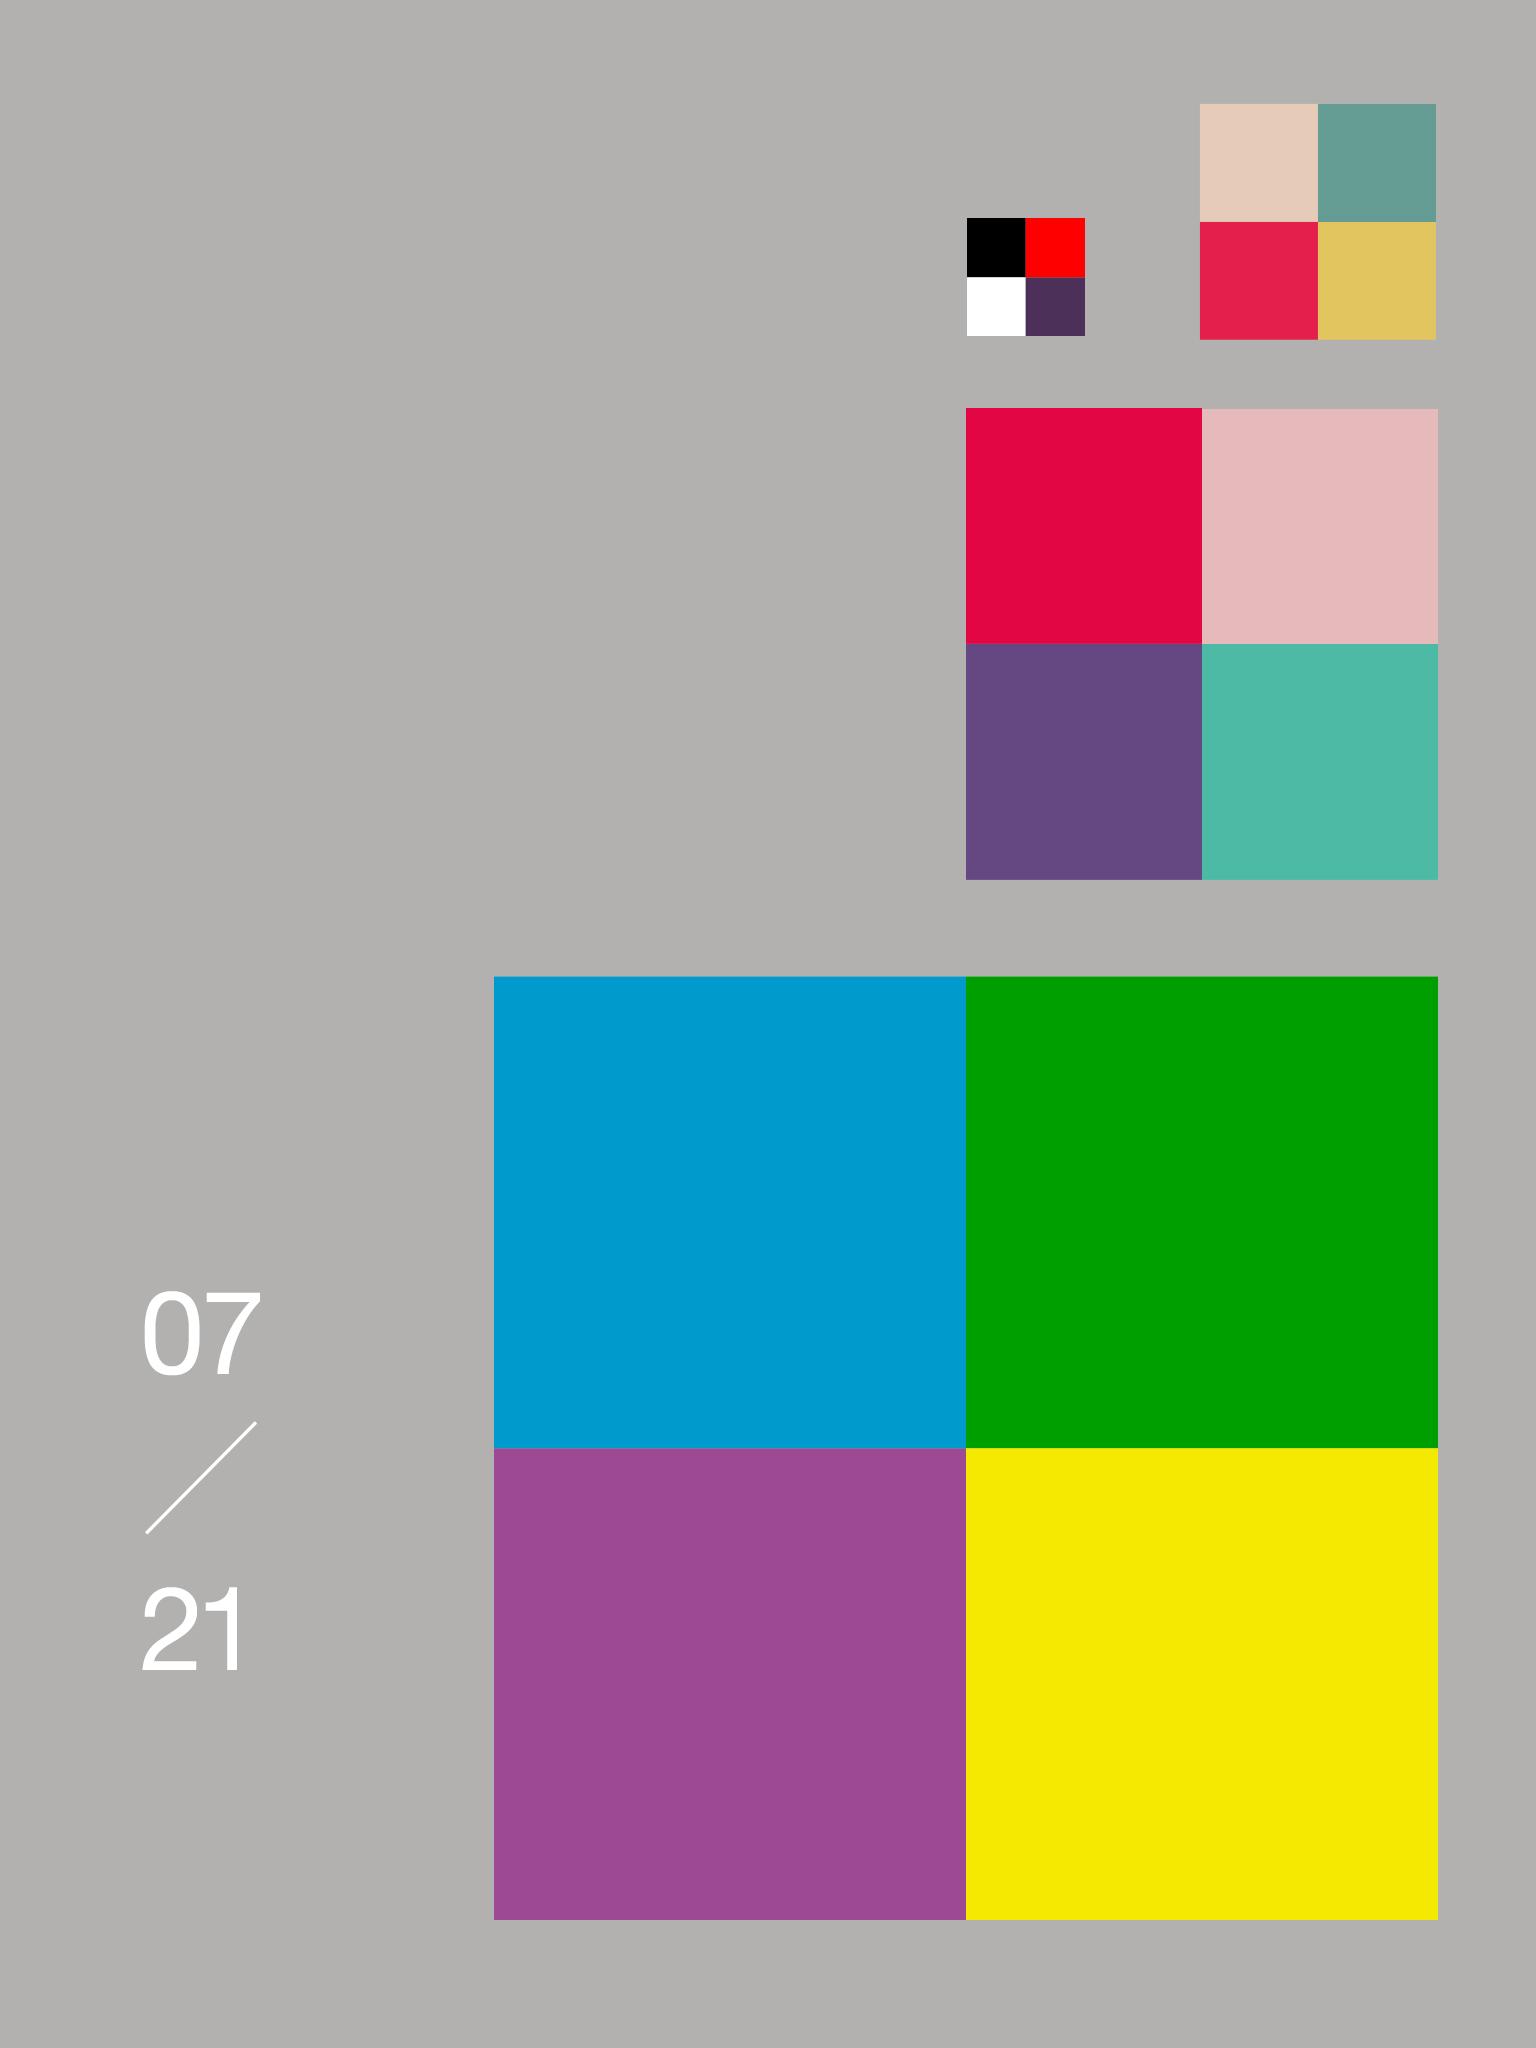 July's Best Music